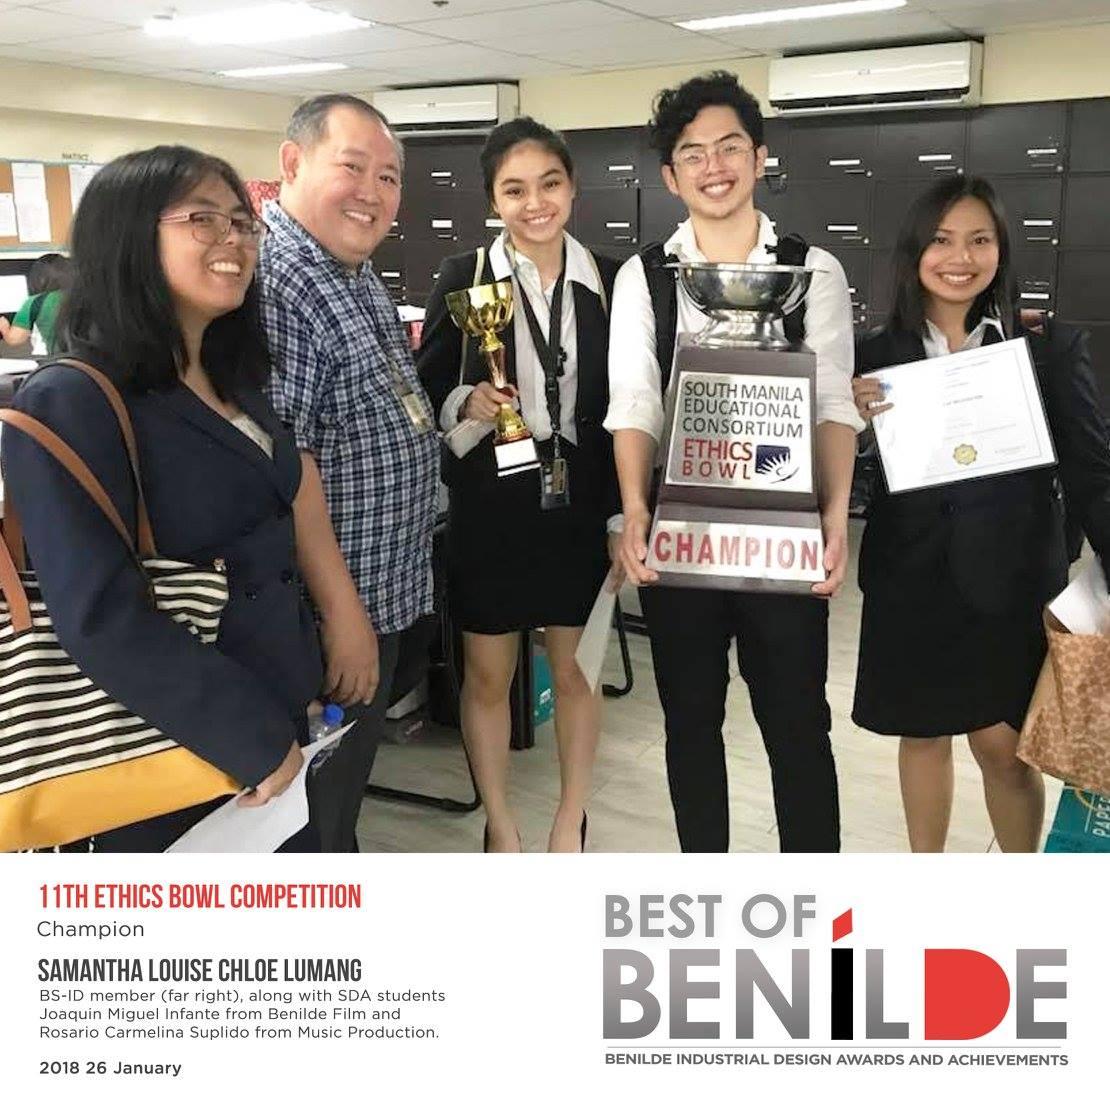 4_Ethics Bowl Competition_Sam Lumang 2018